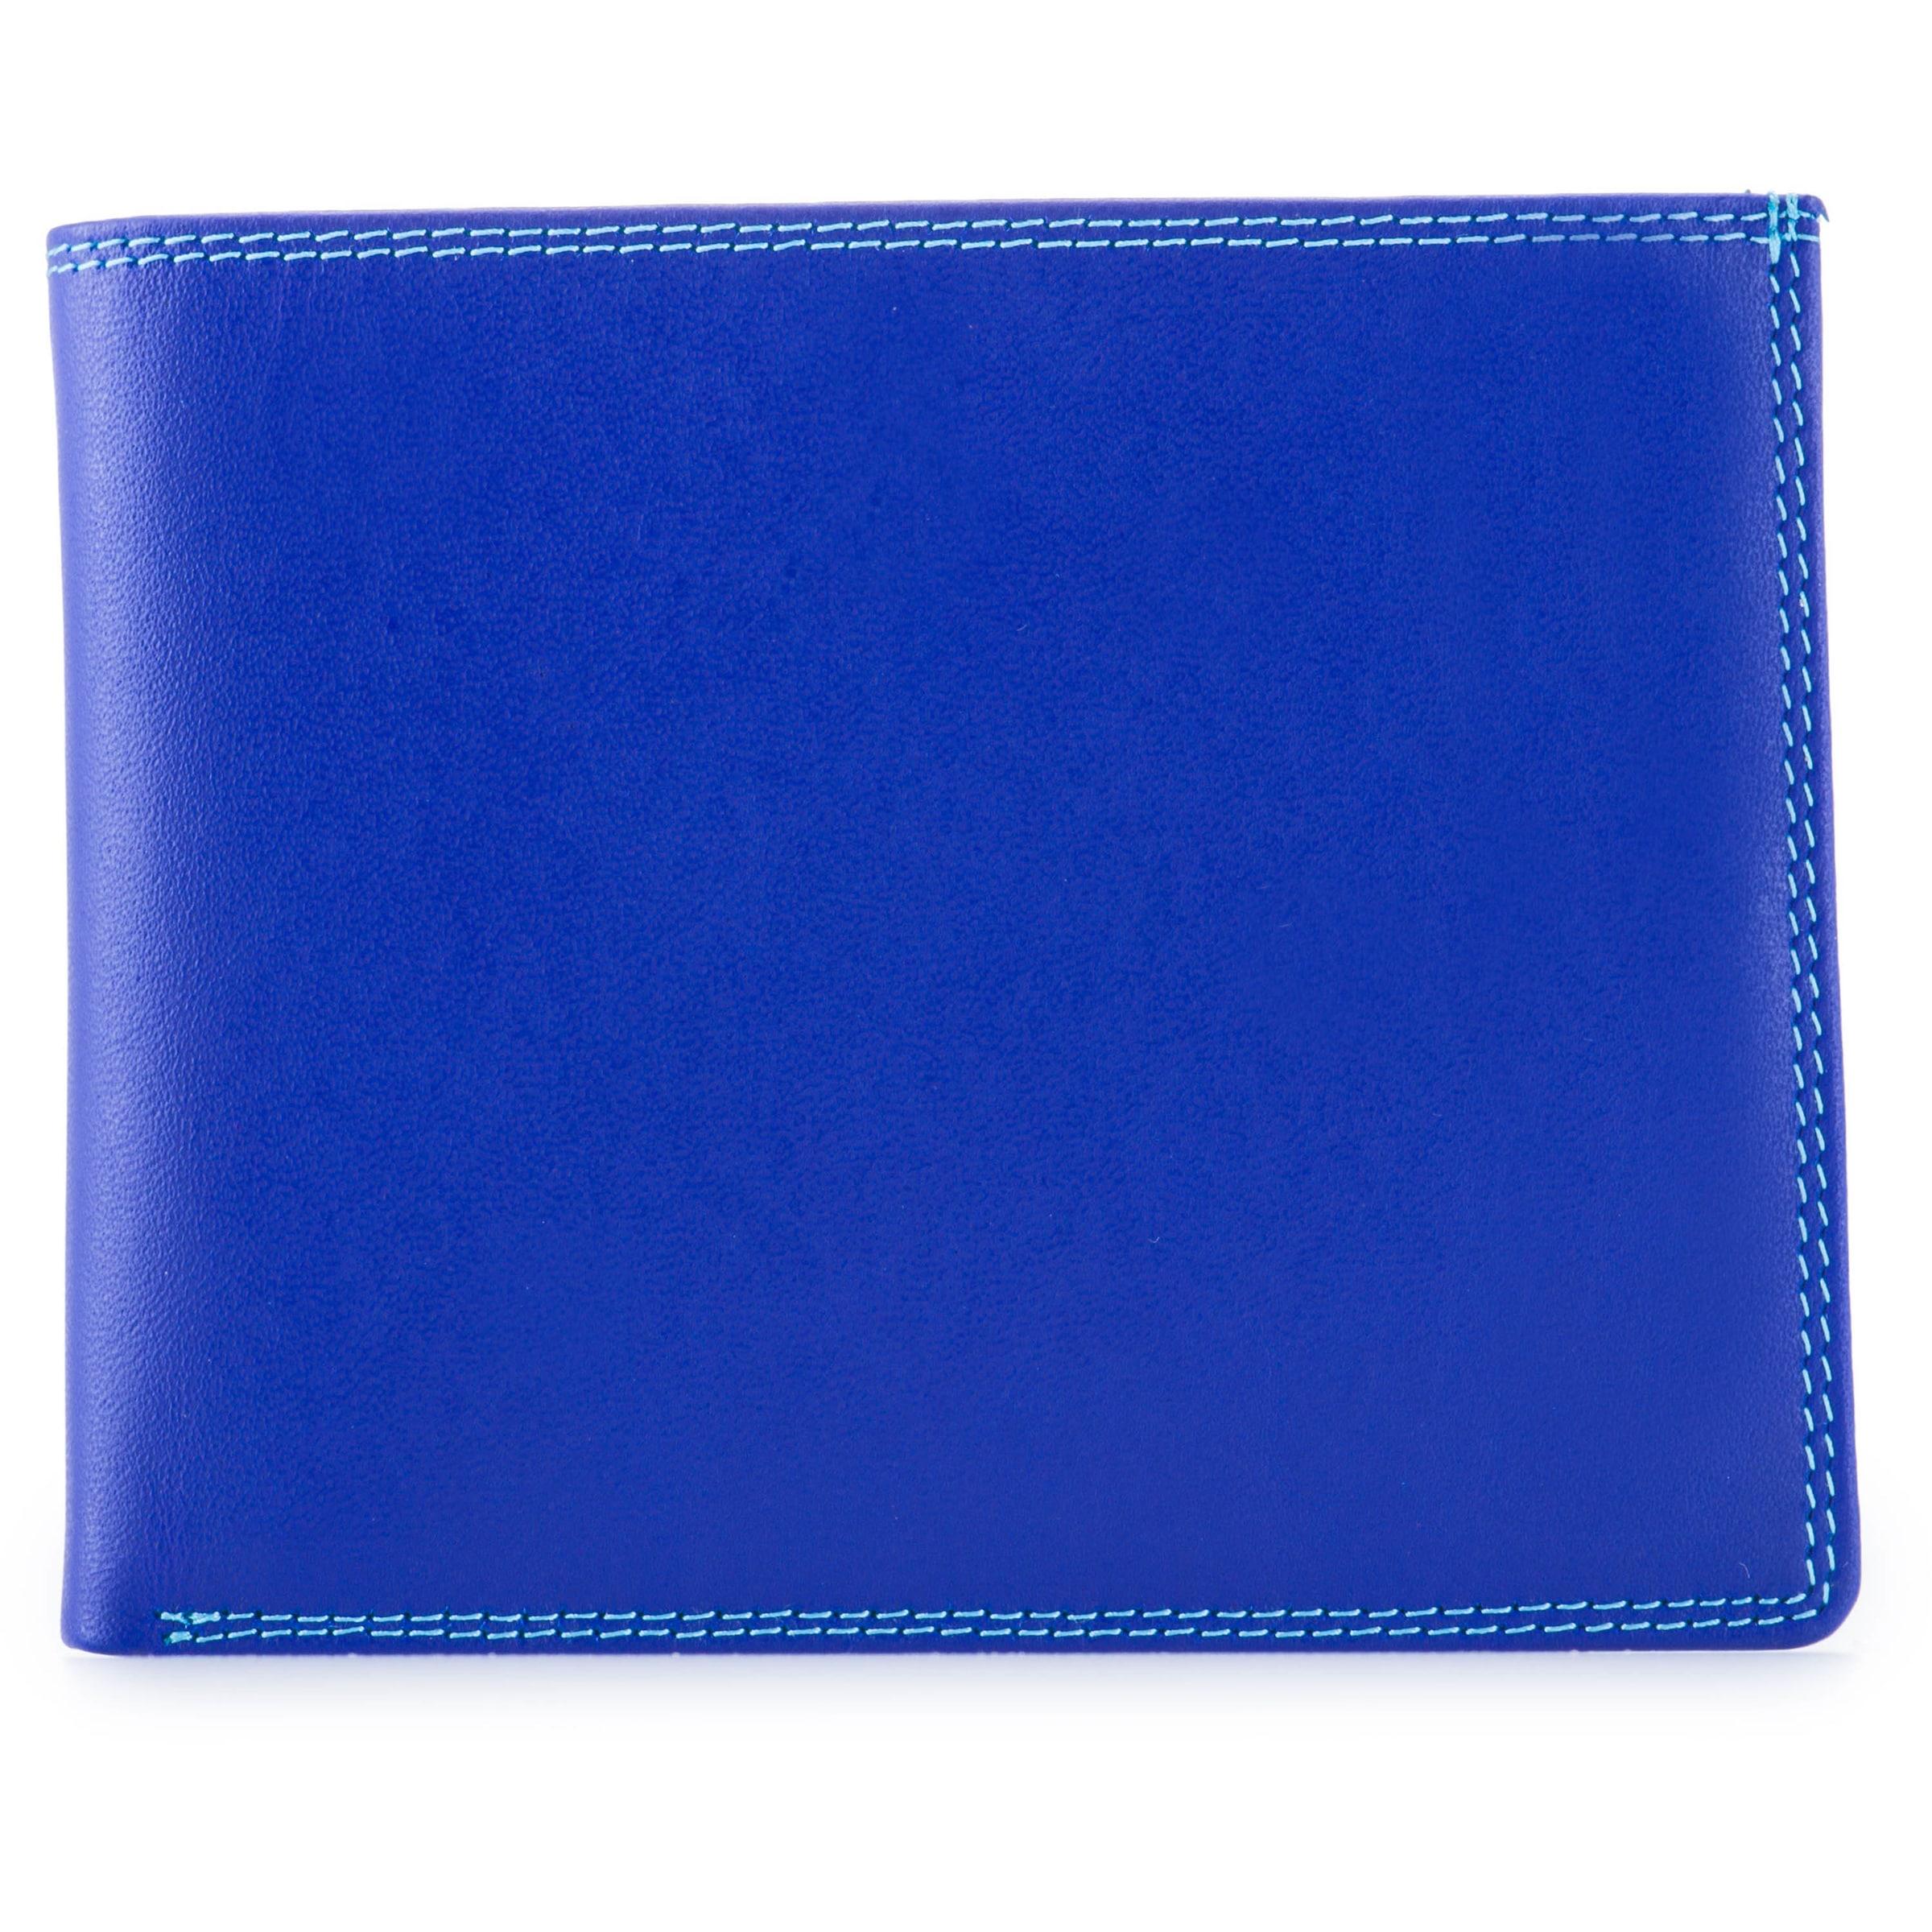 Blau Blau Geldbörse Geldbörse In Mywalit In Mywalit 7gyv6YIbf